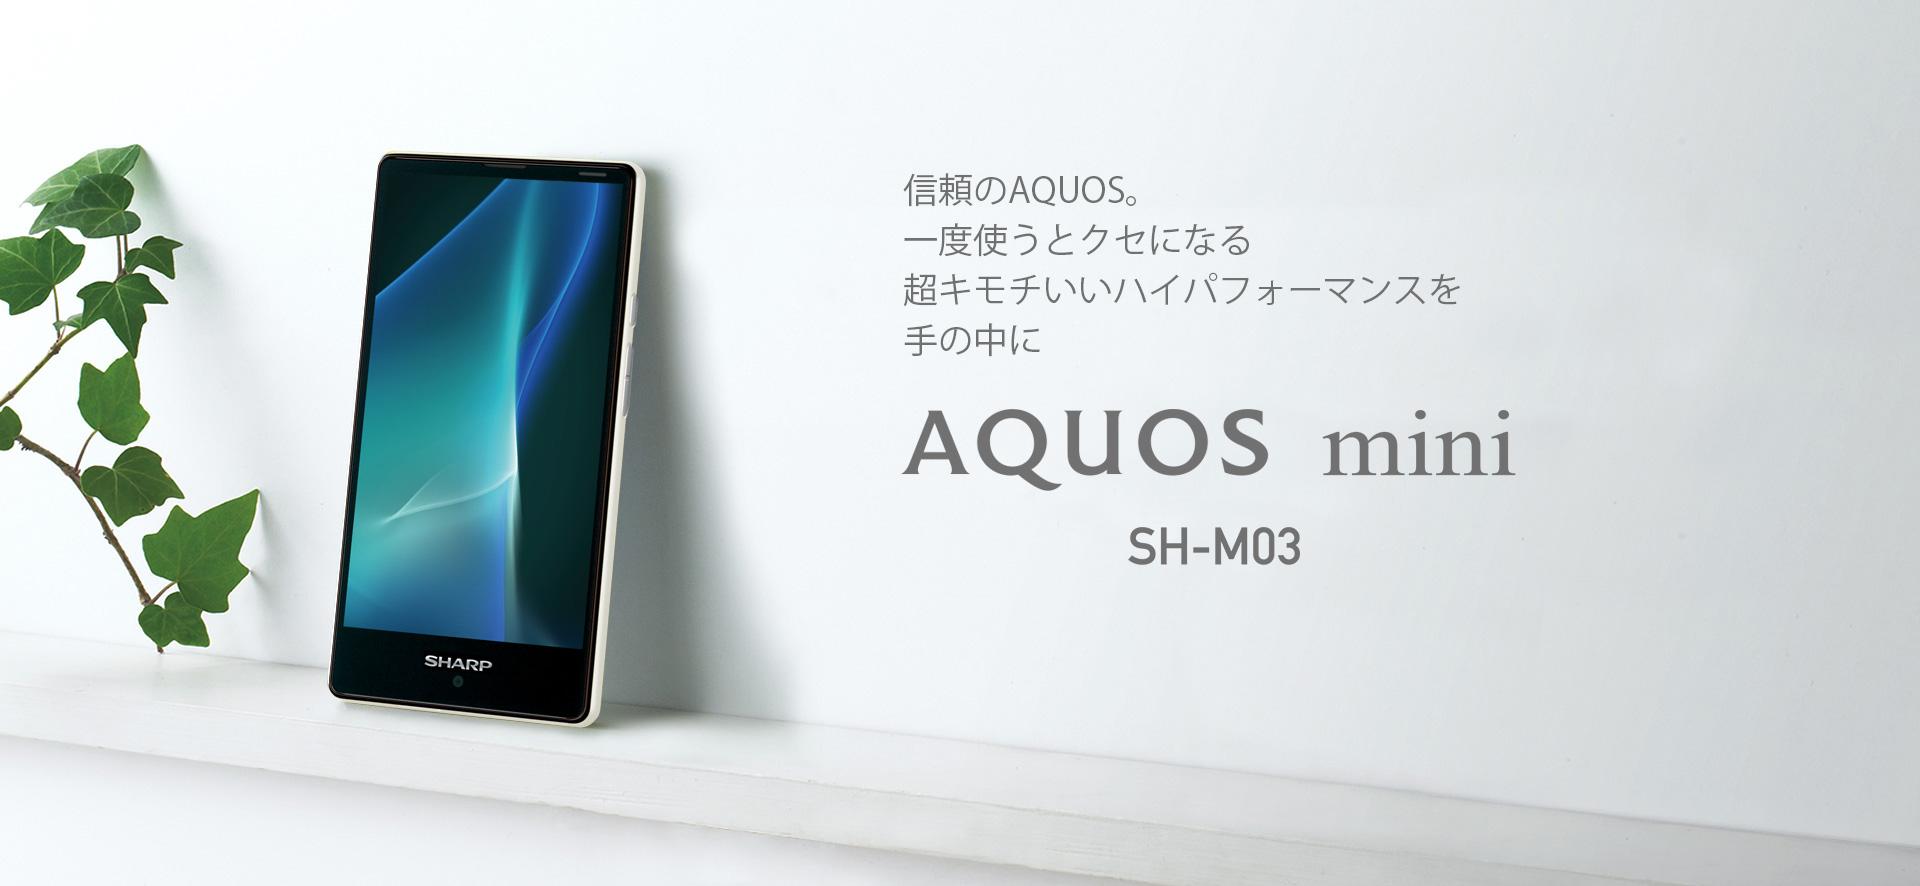 Sharp Aquos Mini : un séduisant petit smartphone de 4,7 pouces